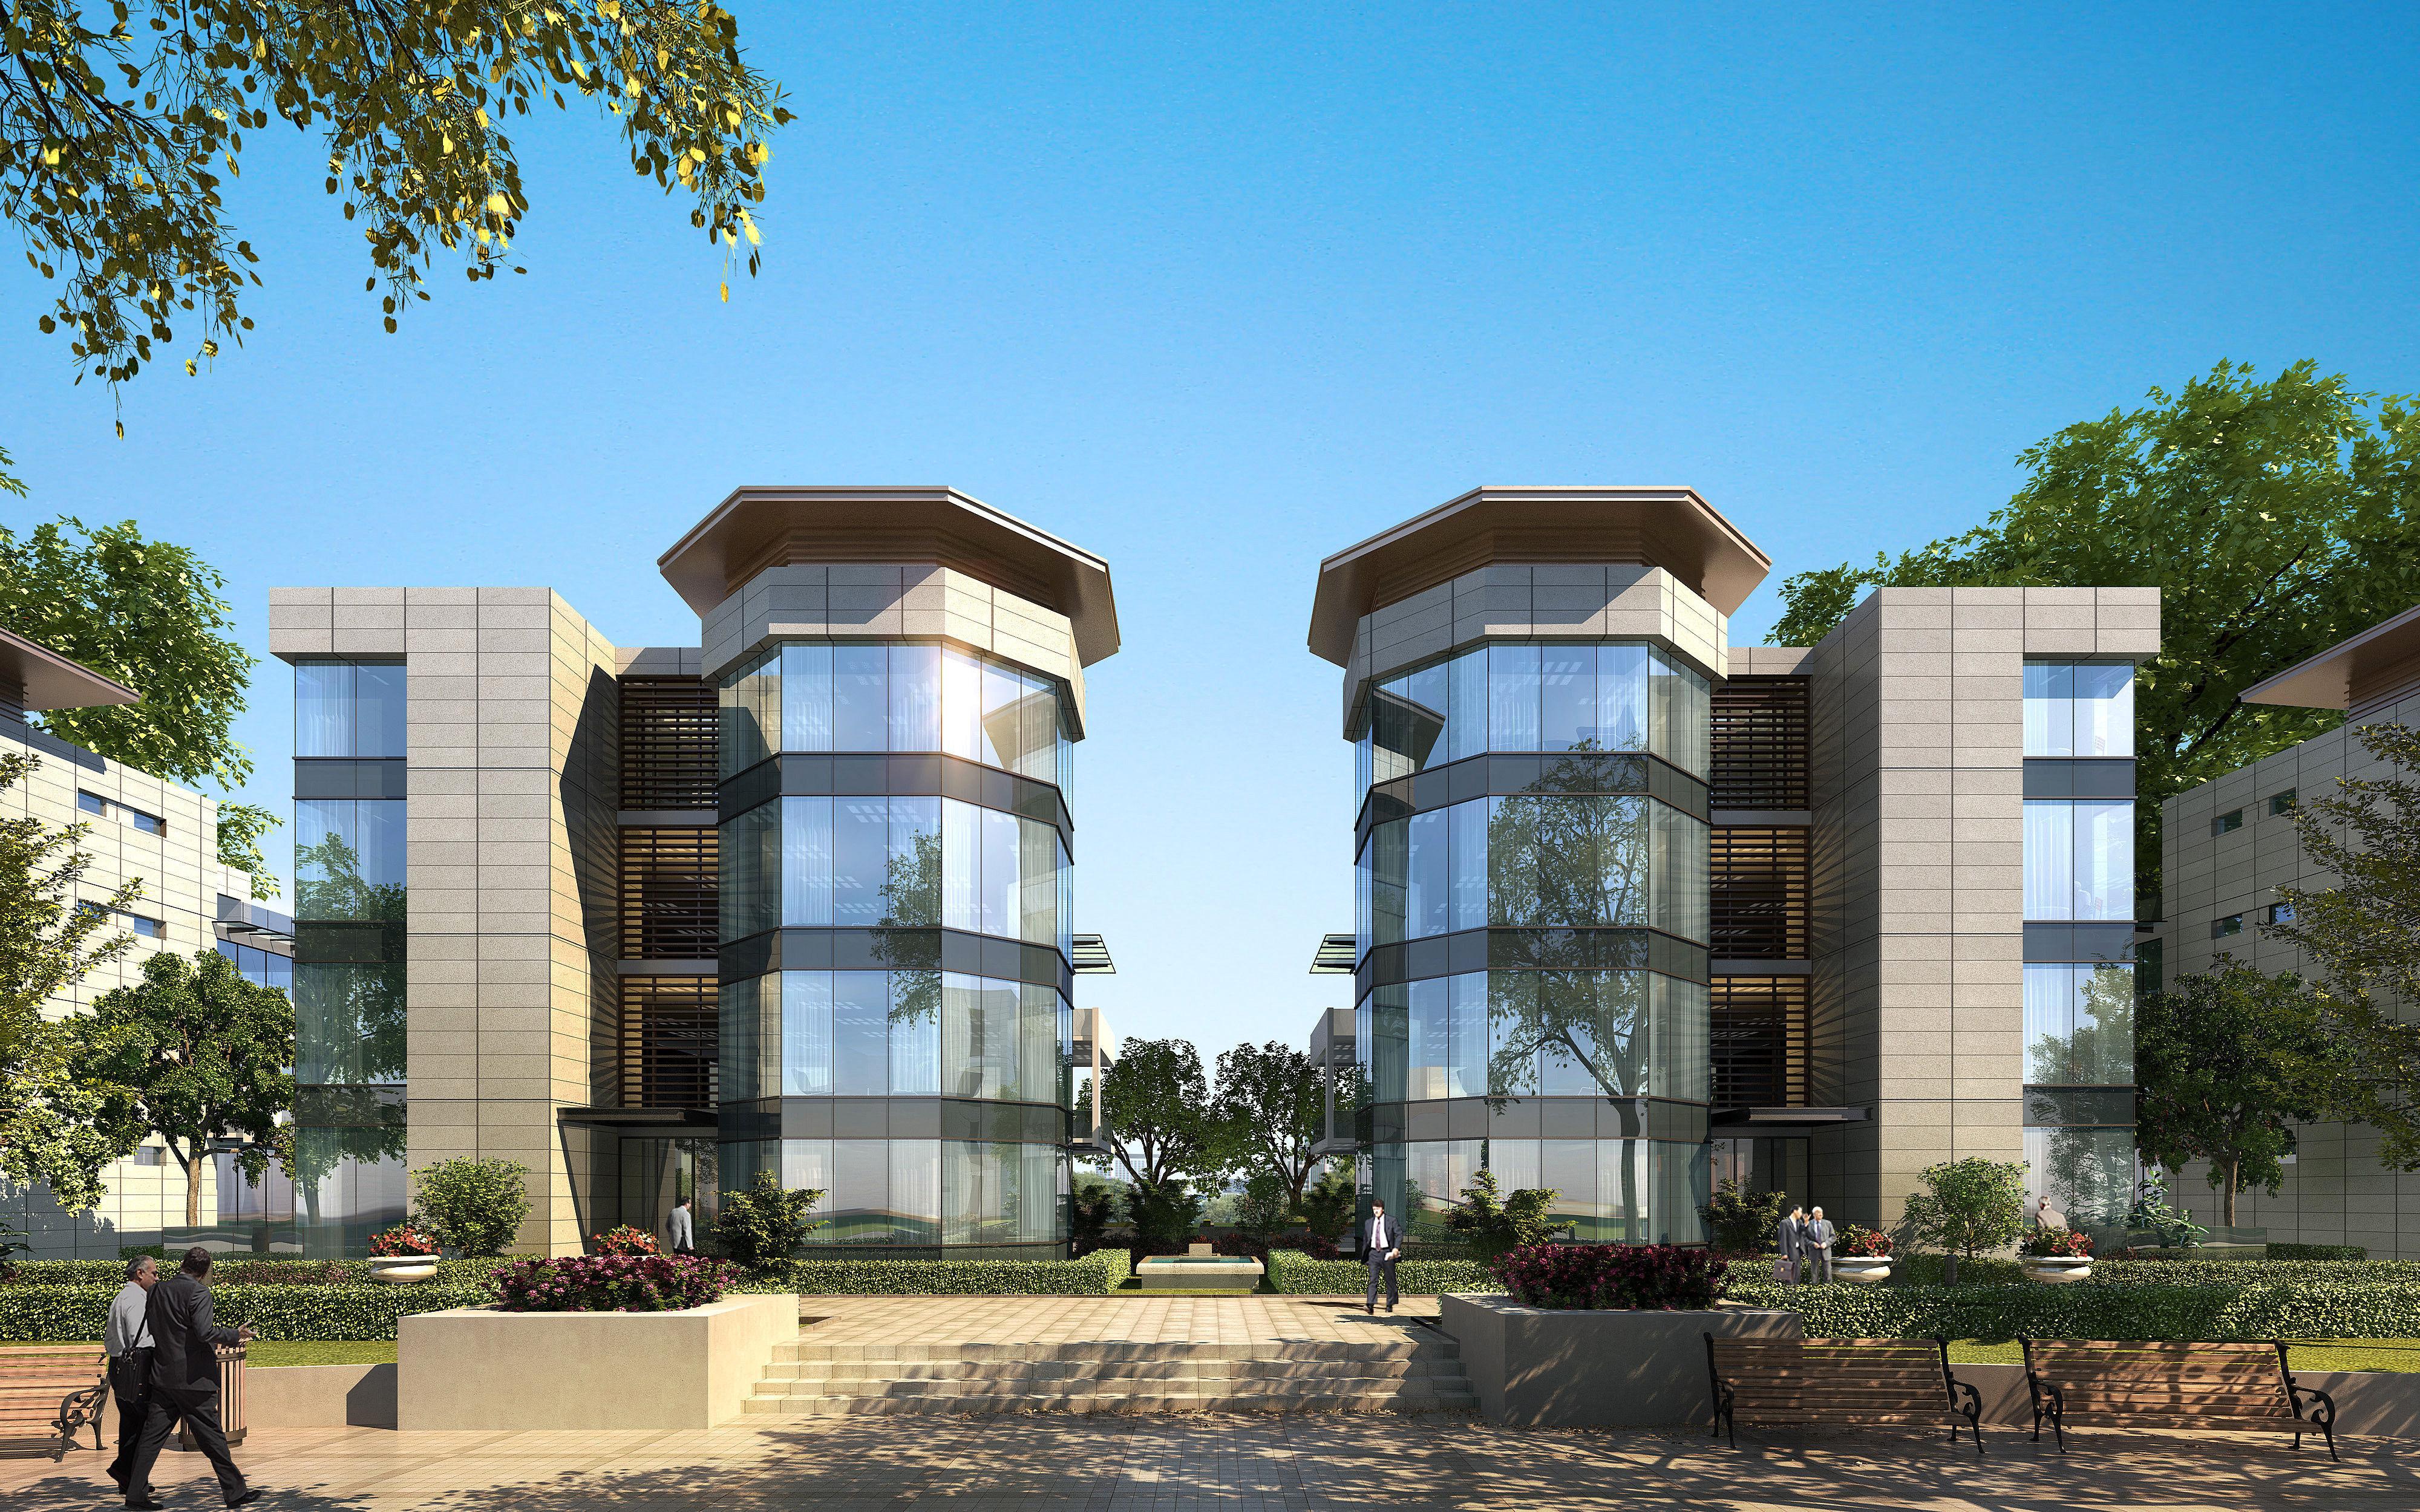 City luxury hotel villa design office 33 3d model max for City hotel design